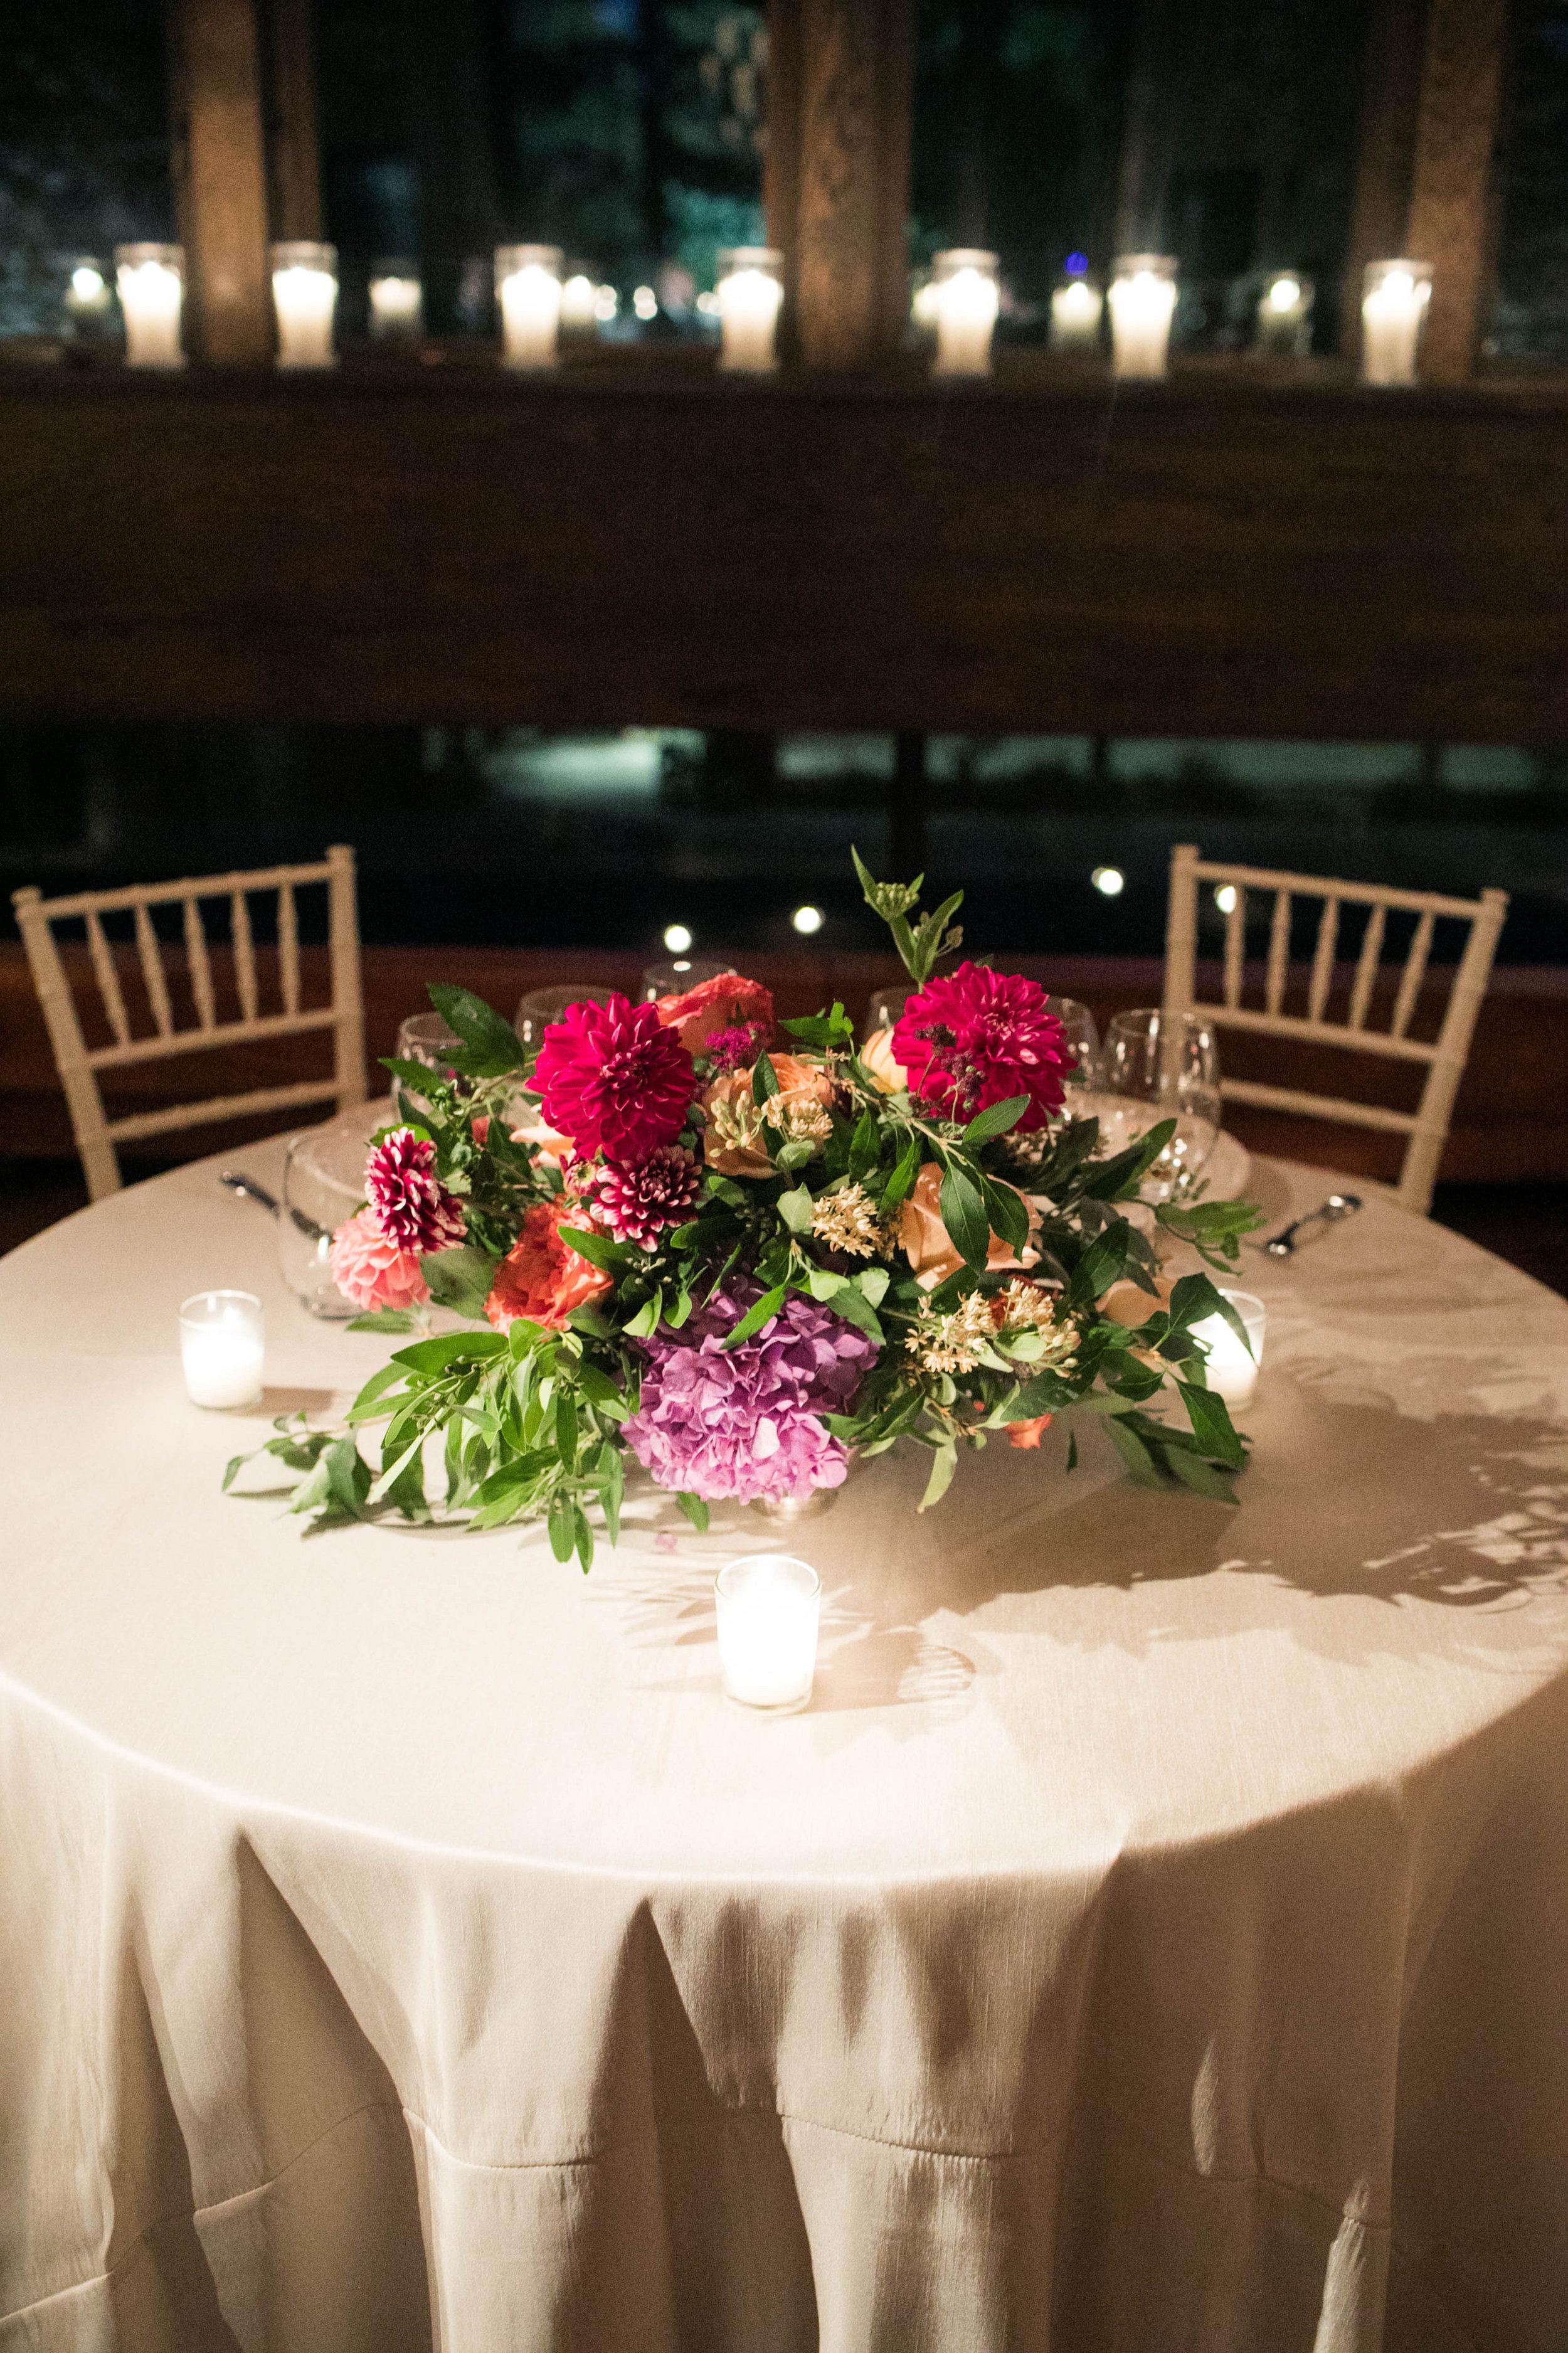 Elegant Affair Wedding at the Farm - Flowers by Denise Fasanello Flowers - Photos by Meg Miller 7.JPG